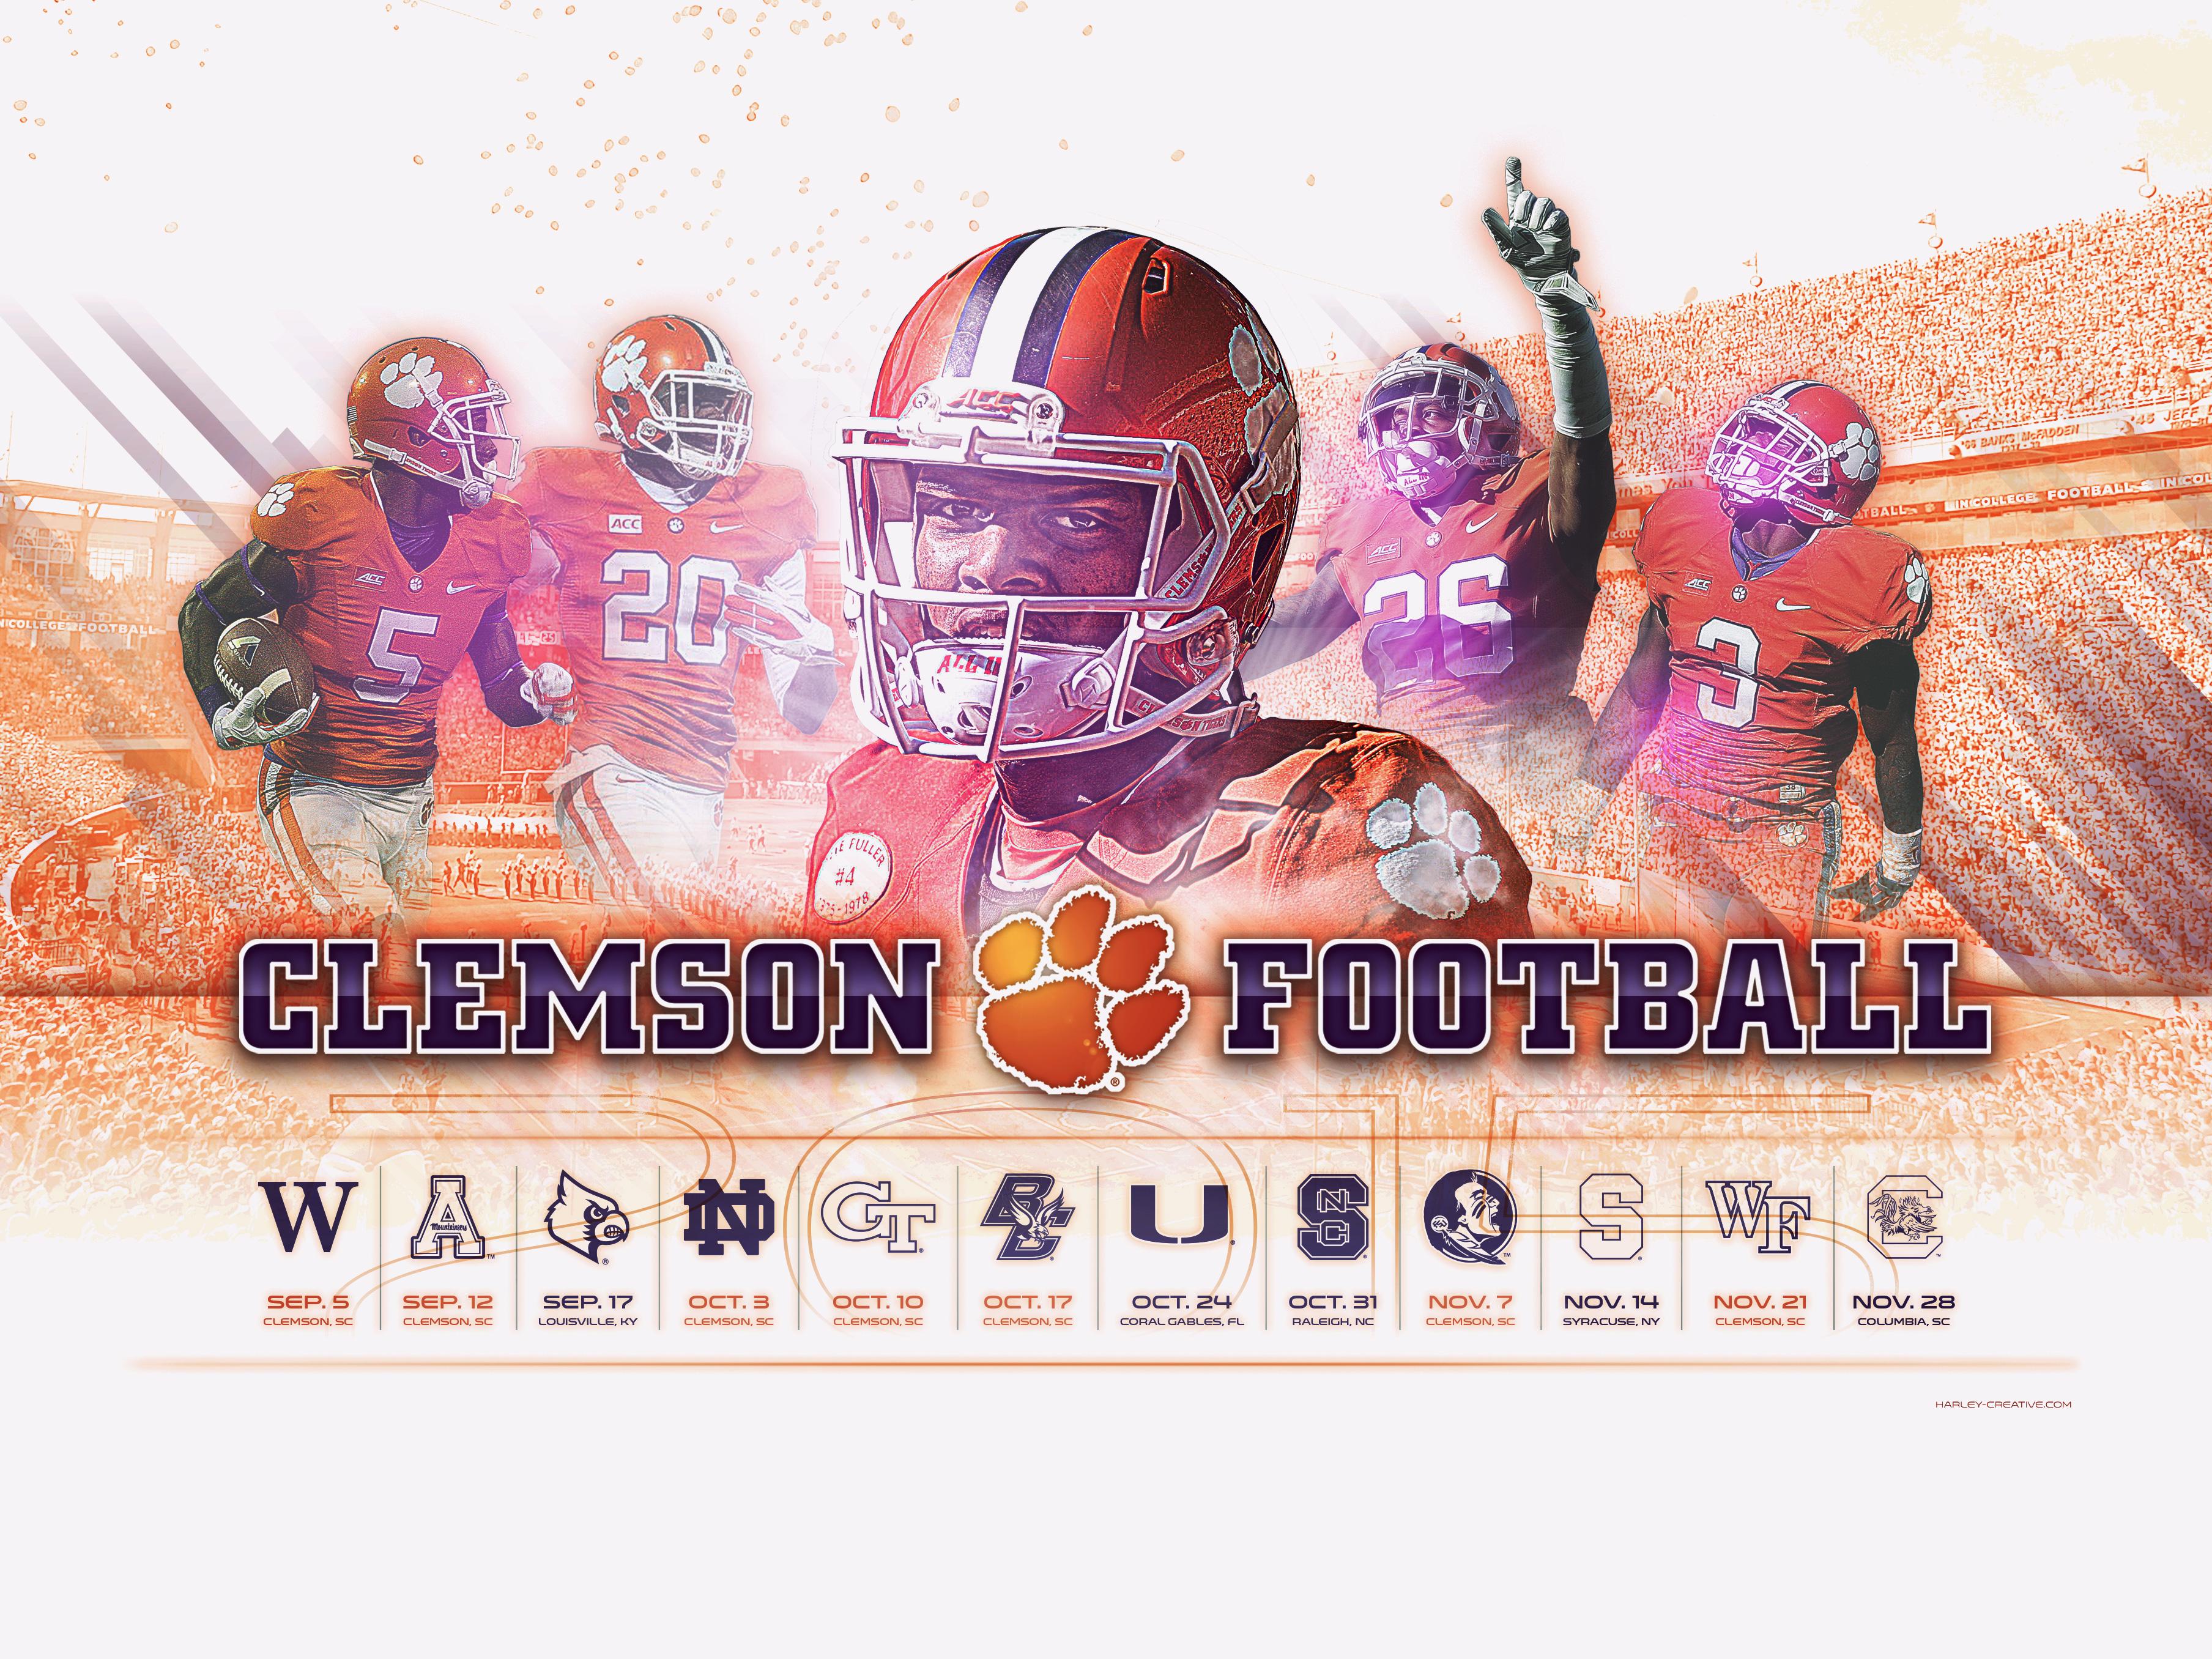 Harley Creative 2015 Clemson Football Wallpaper 3616x2712